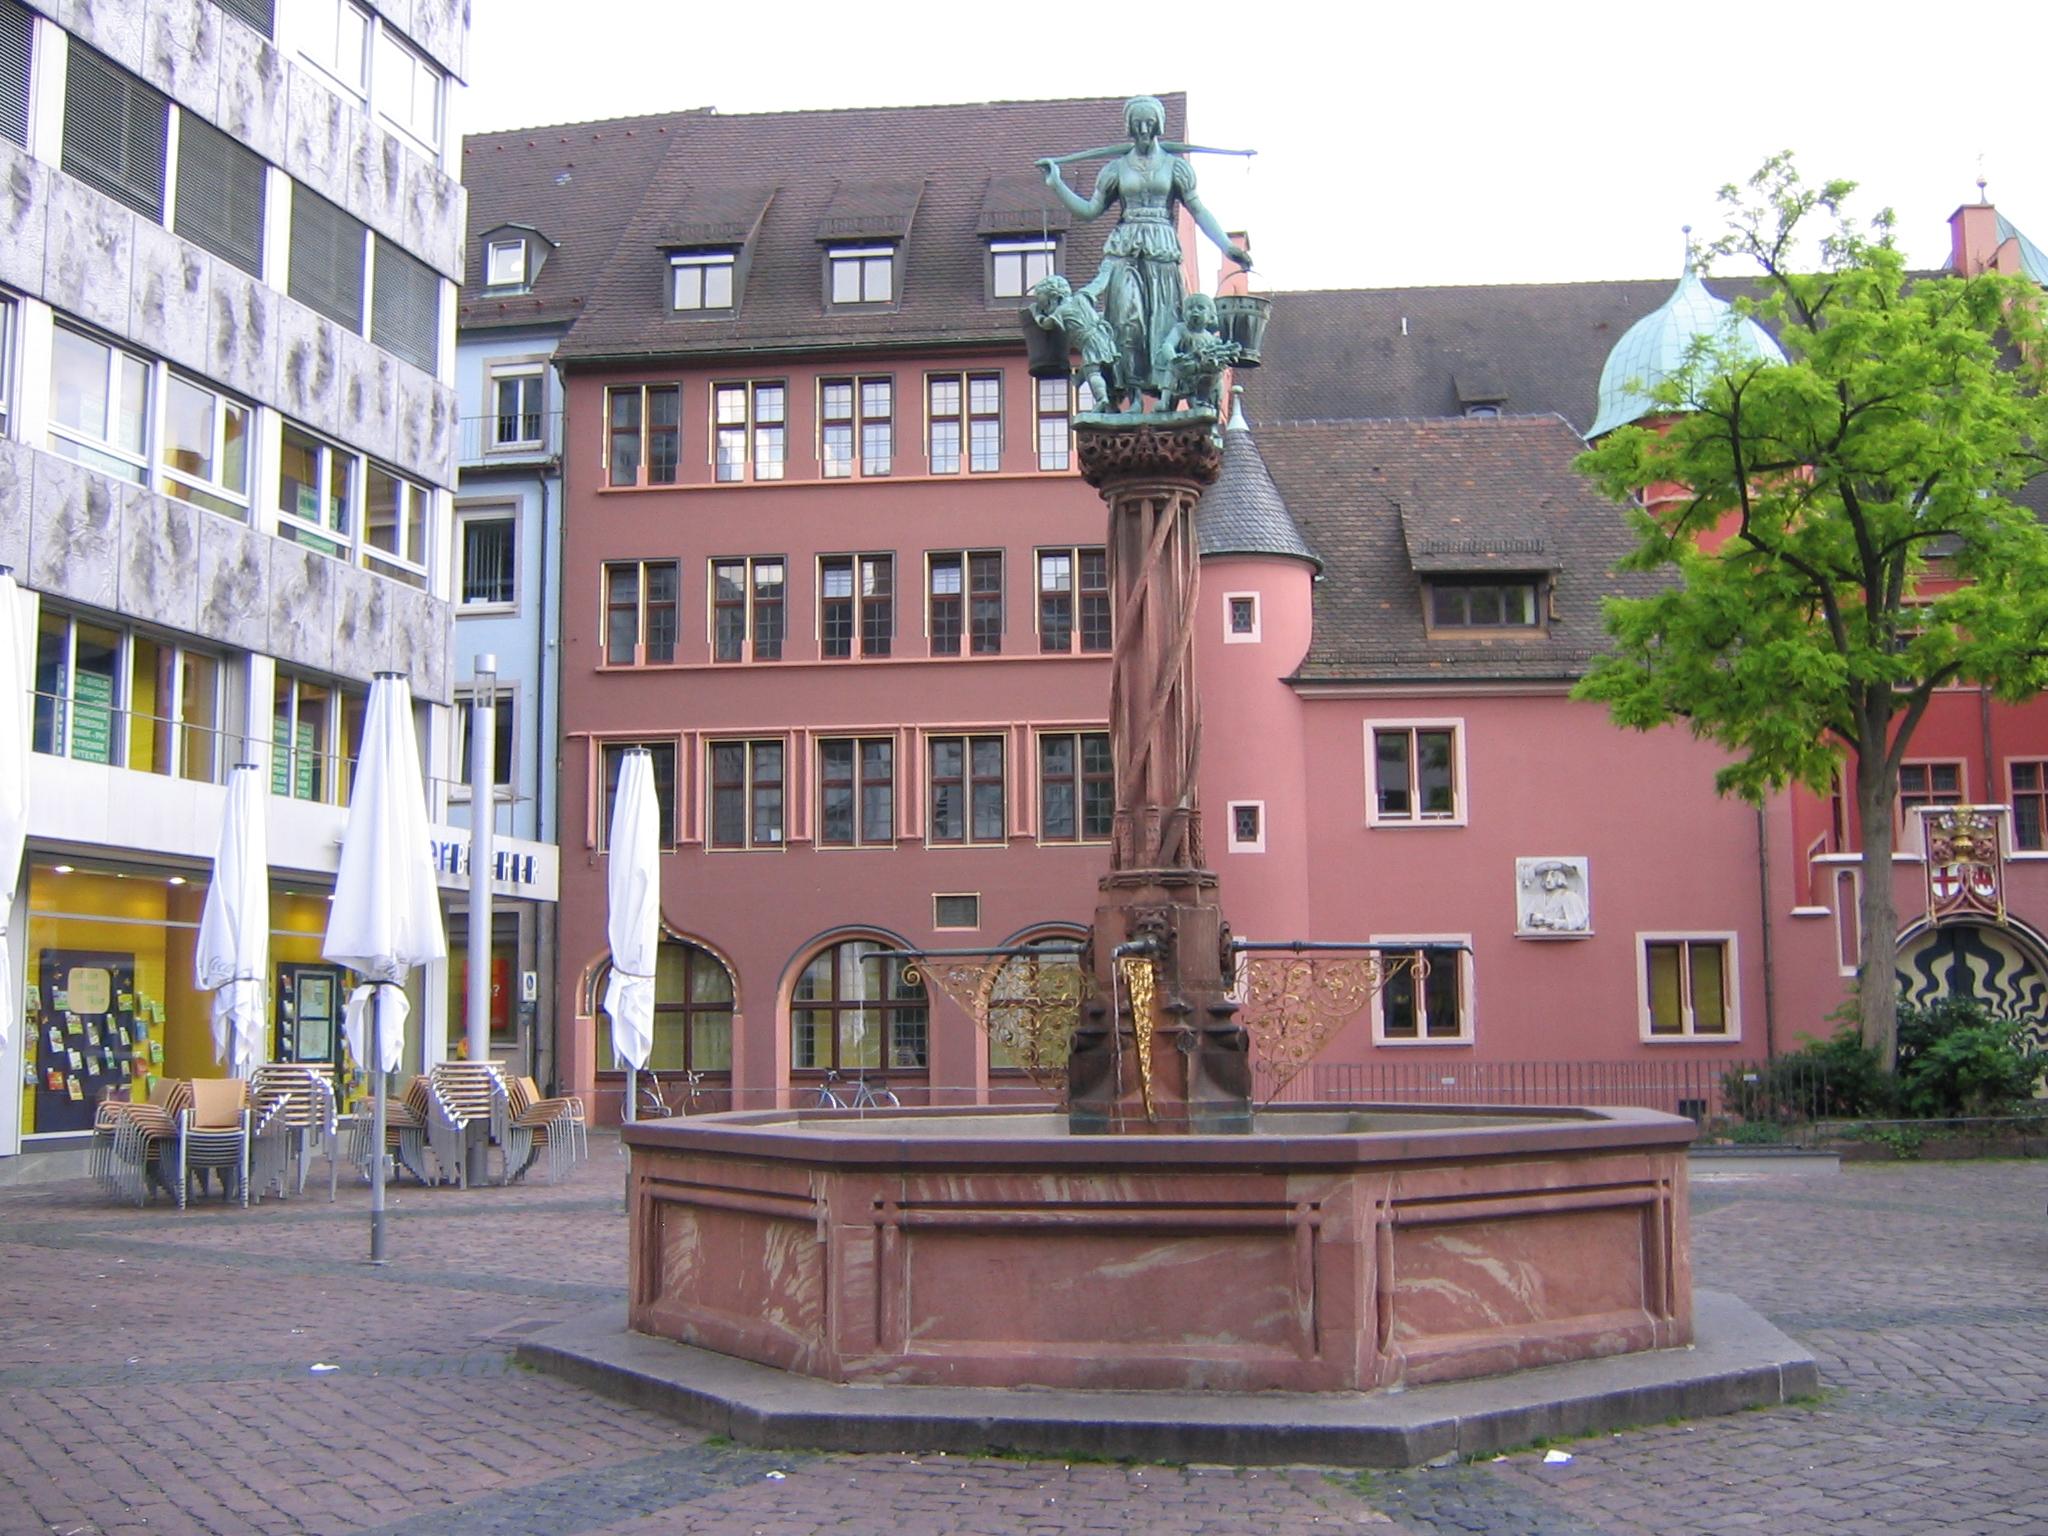 Bauunternehmen Freiburg Im Breisgau carl anton meckel